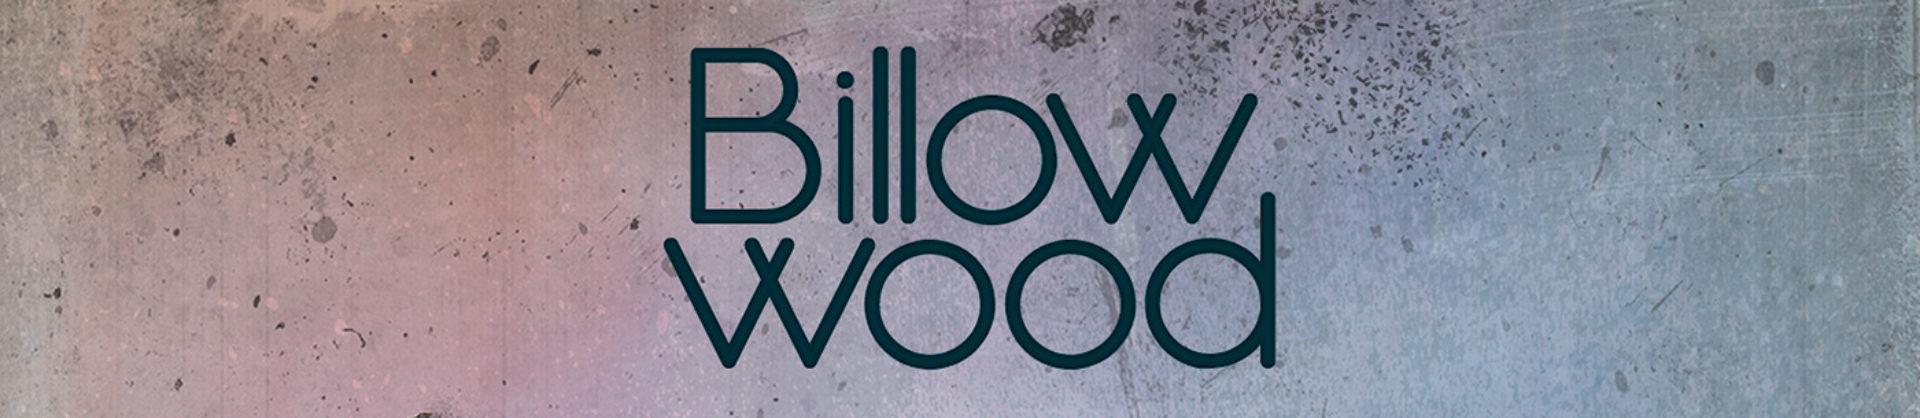 Billow Wood